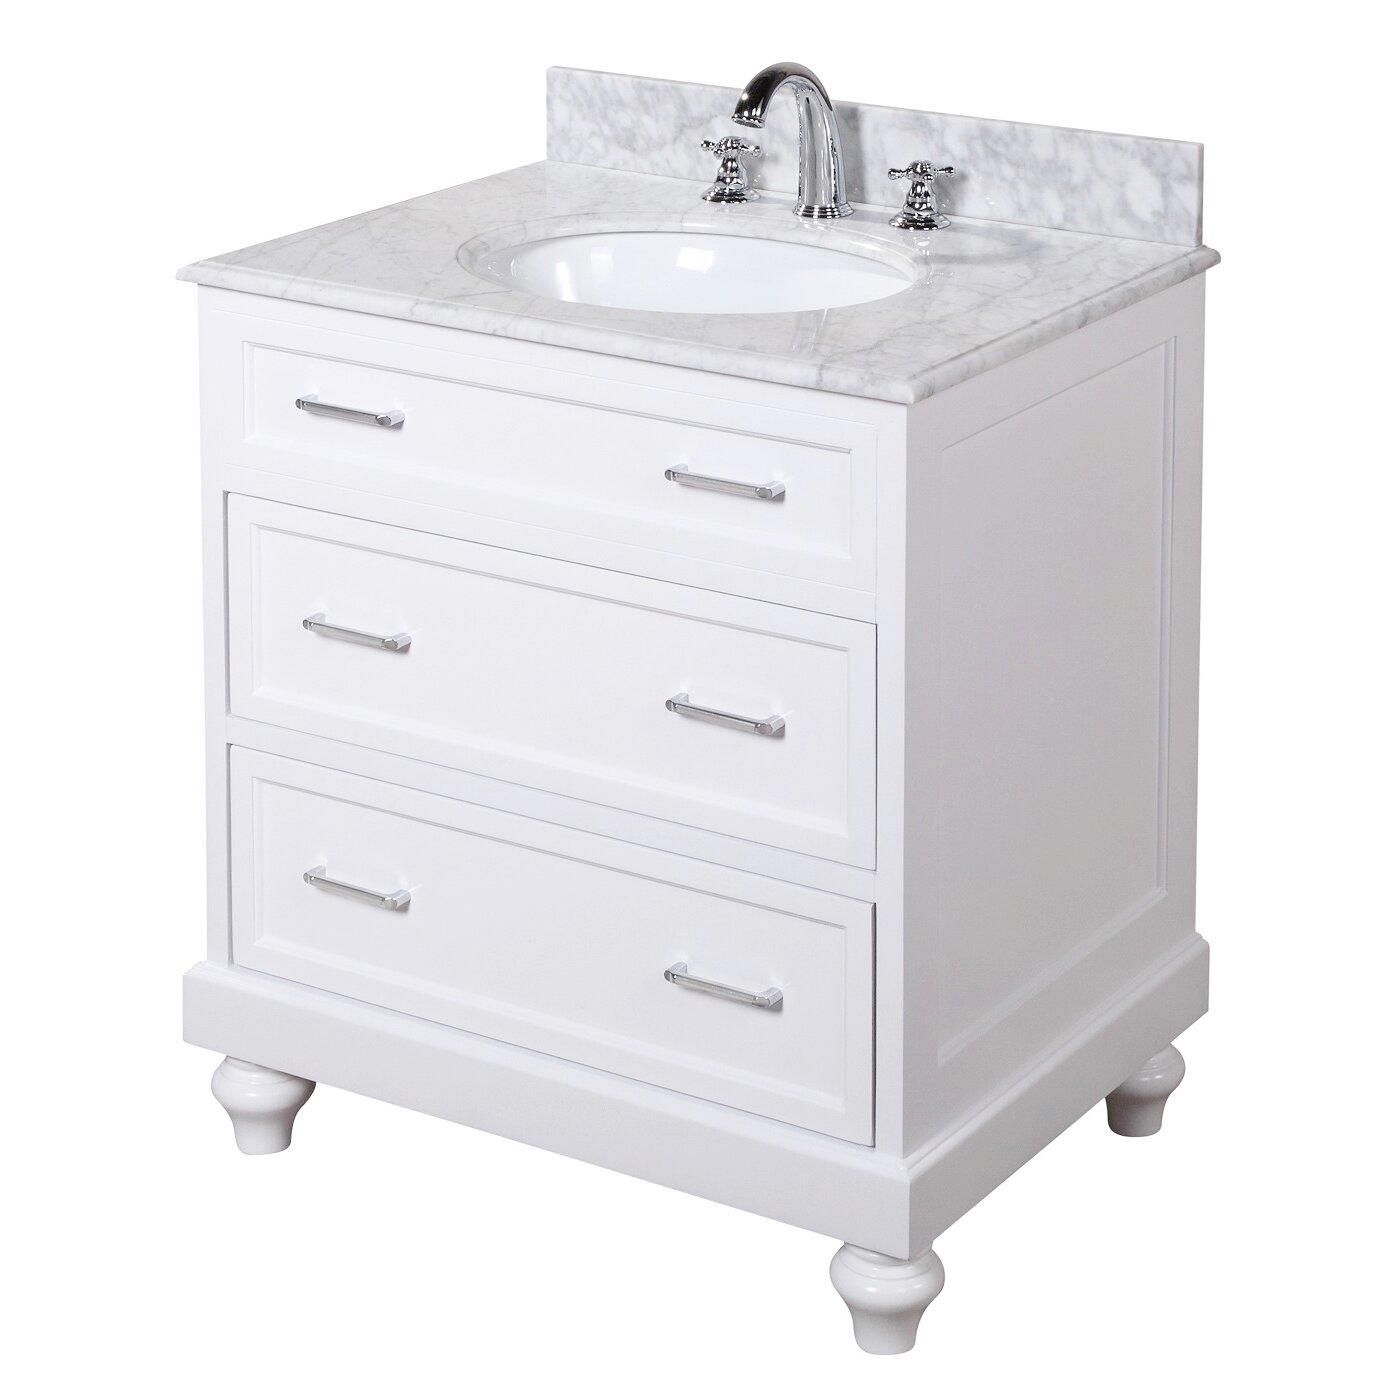 Kbc Amelia 30 Single Bathroom Vanity Set Reviews